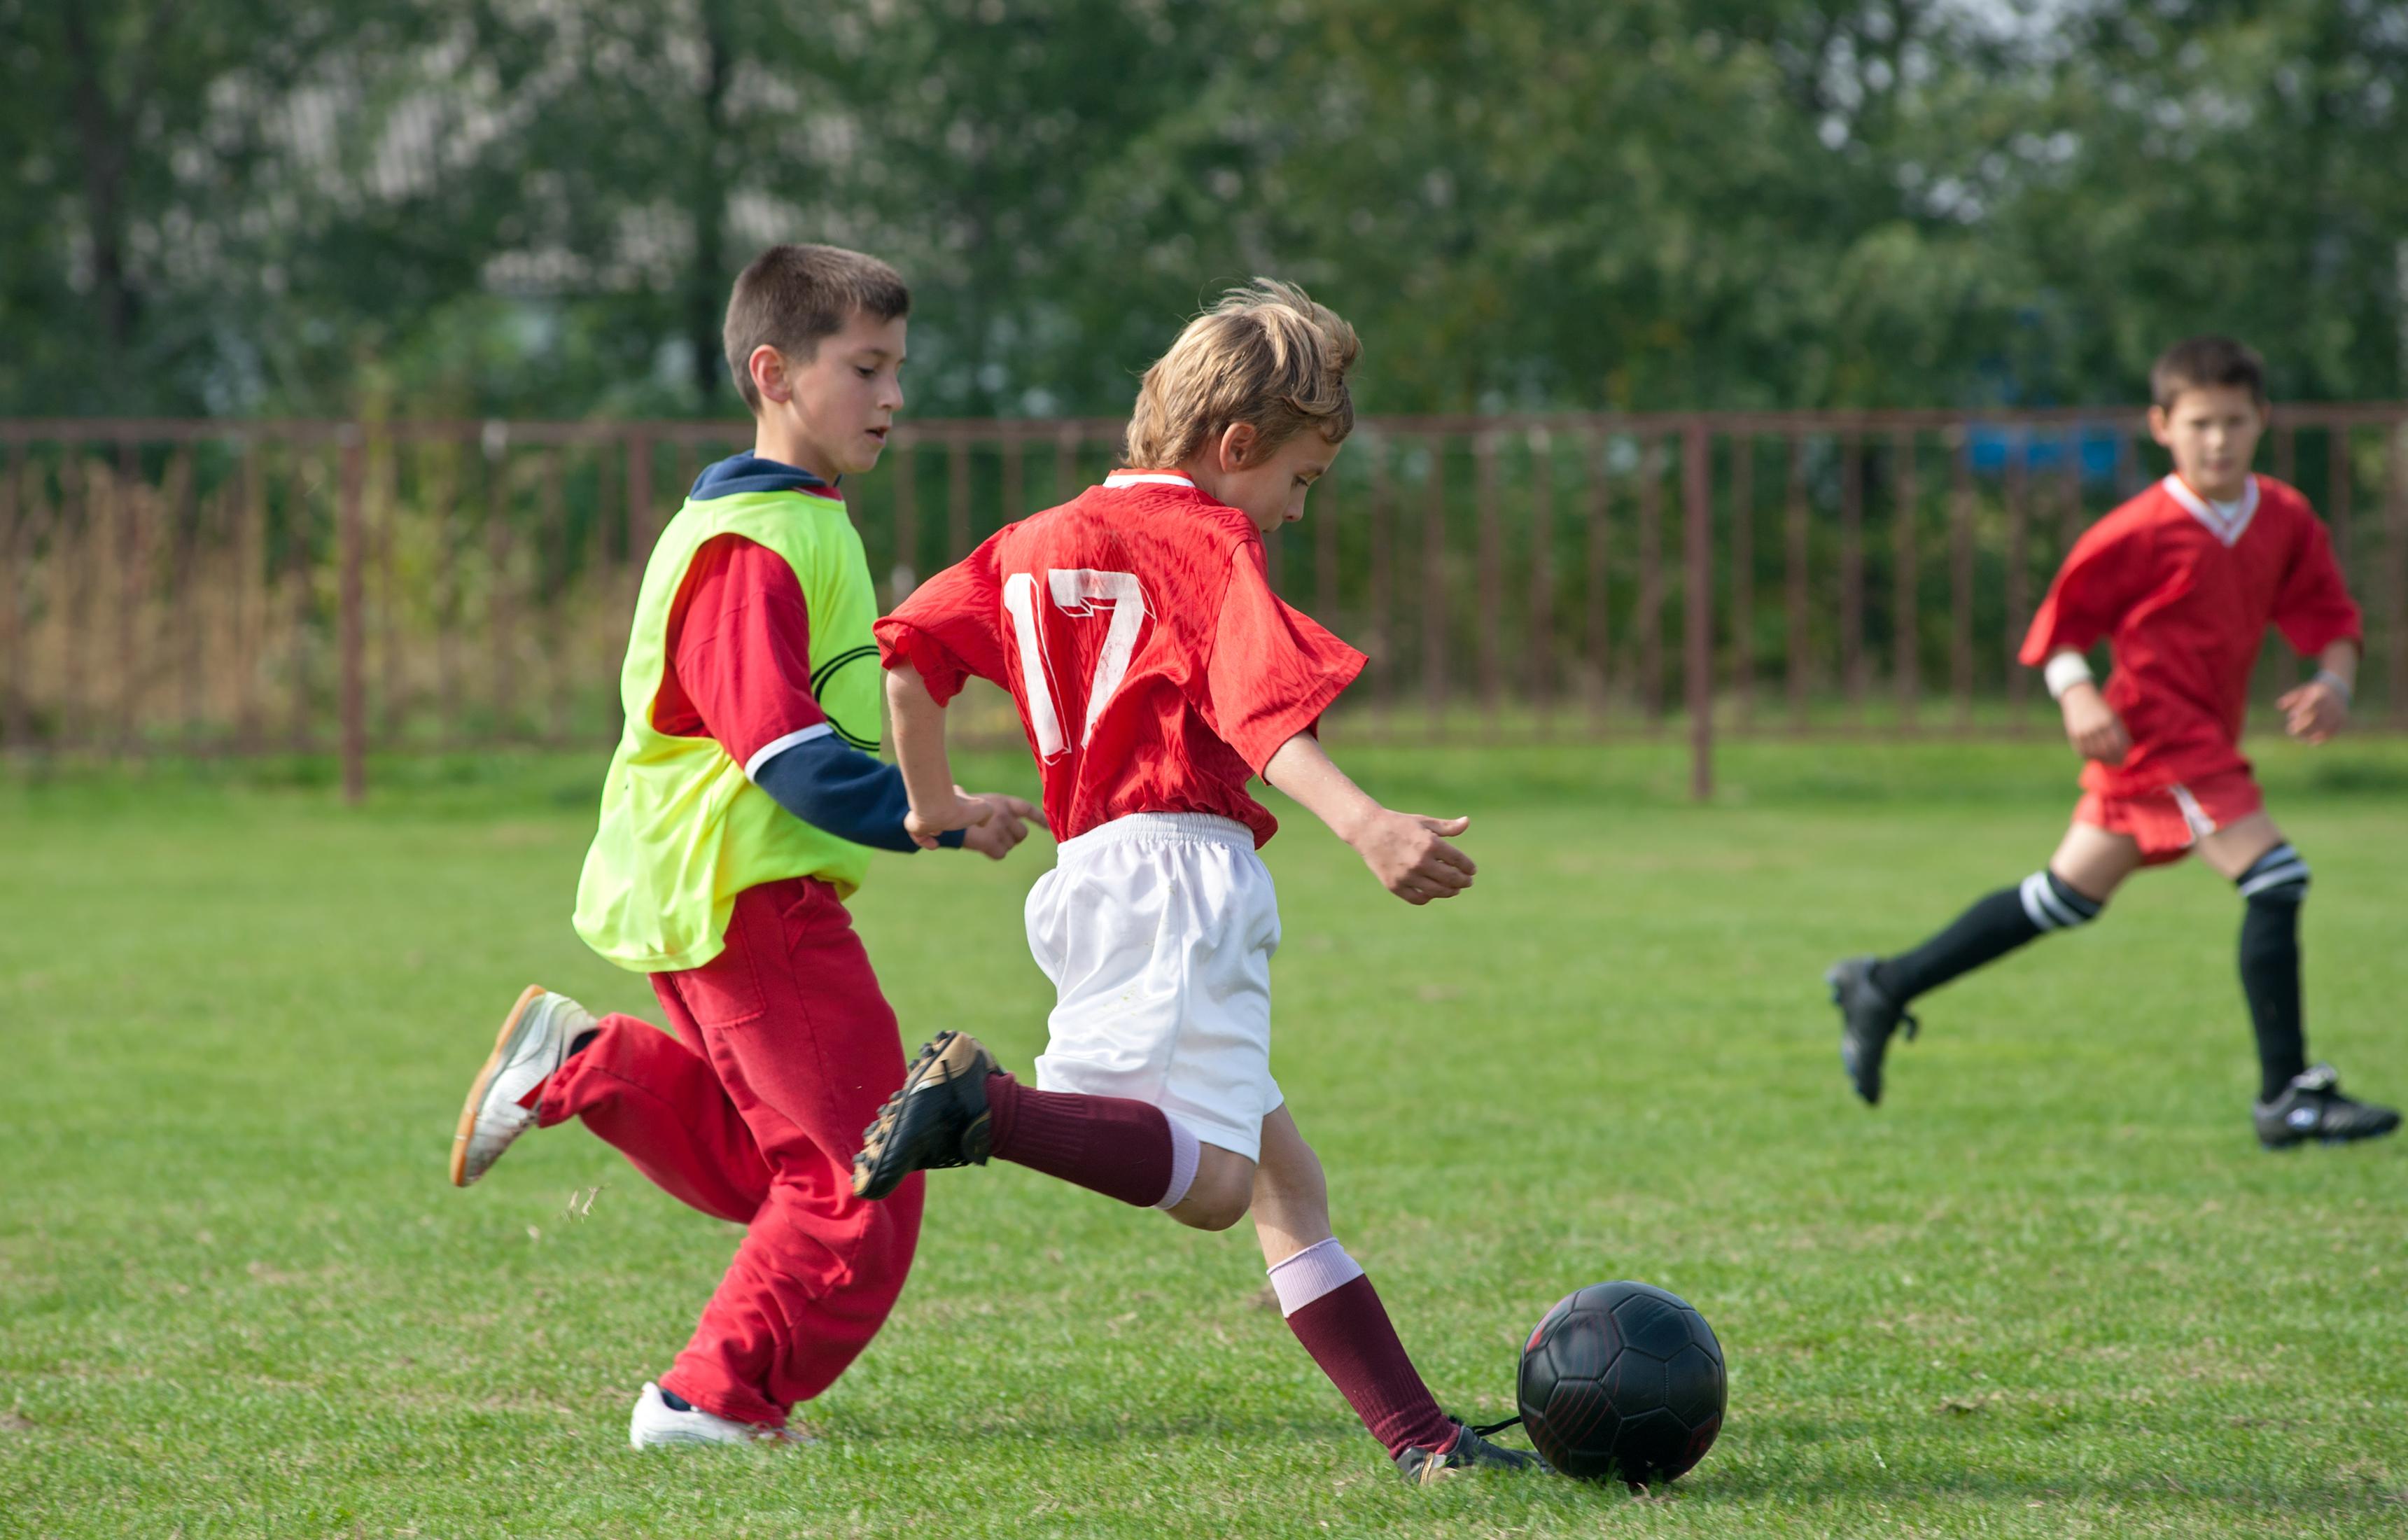 Three boys in uniform playing soccer on a field.